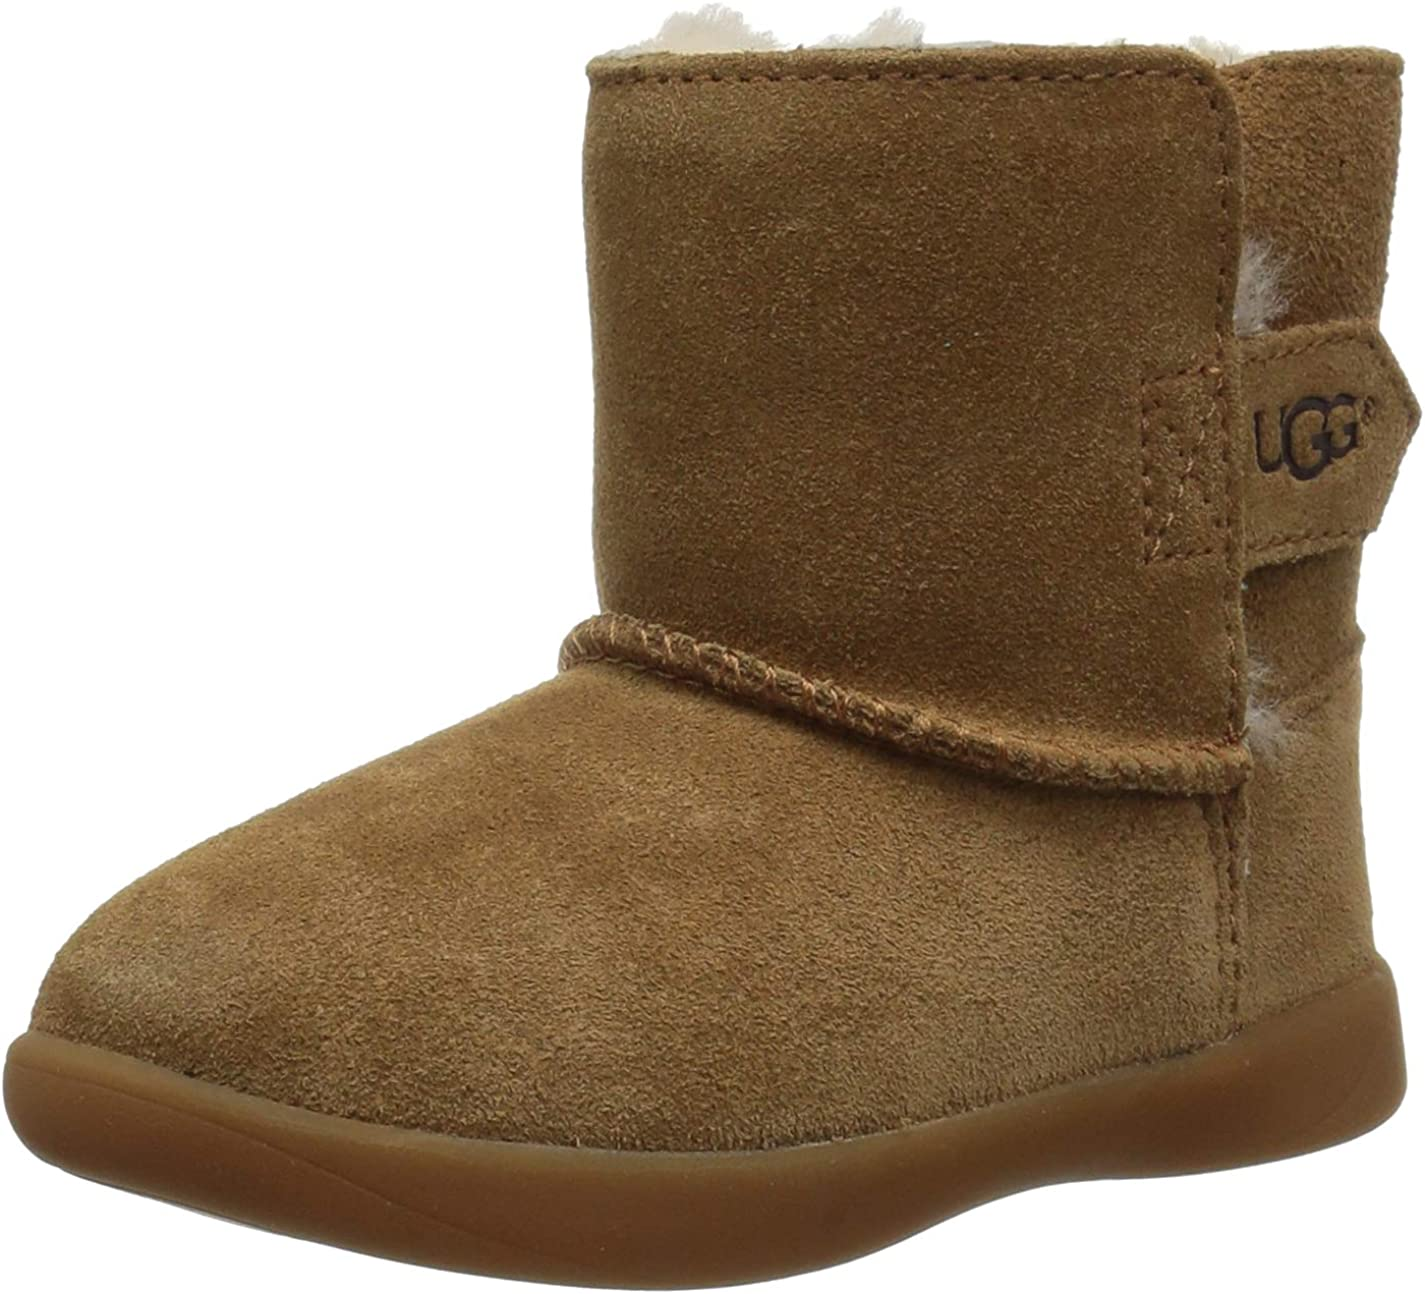   UGG Unisex-Child Keelan Ankle Boot   Chukka